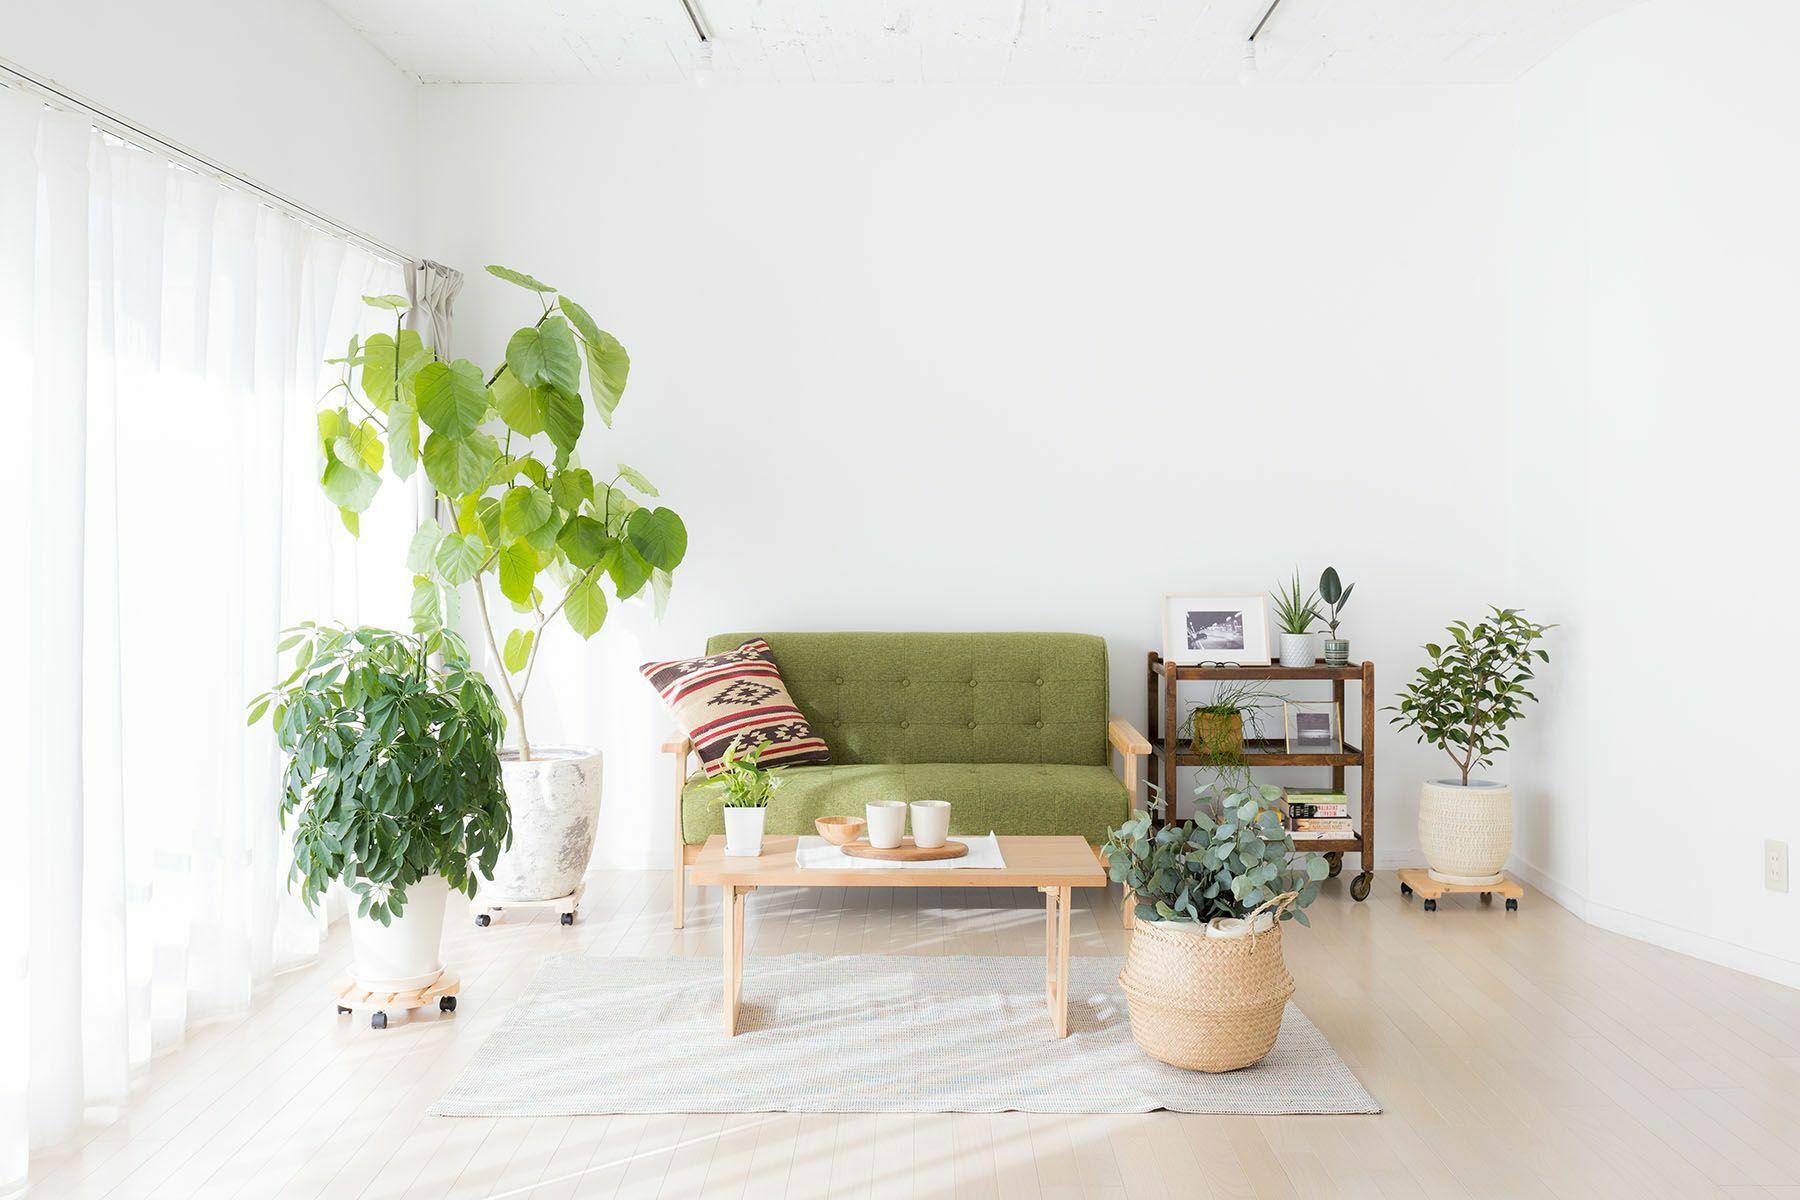 Studio Serato 代々木 (スタジオセラート代々木)自然光の入るシンプルな白壁